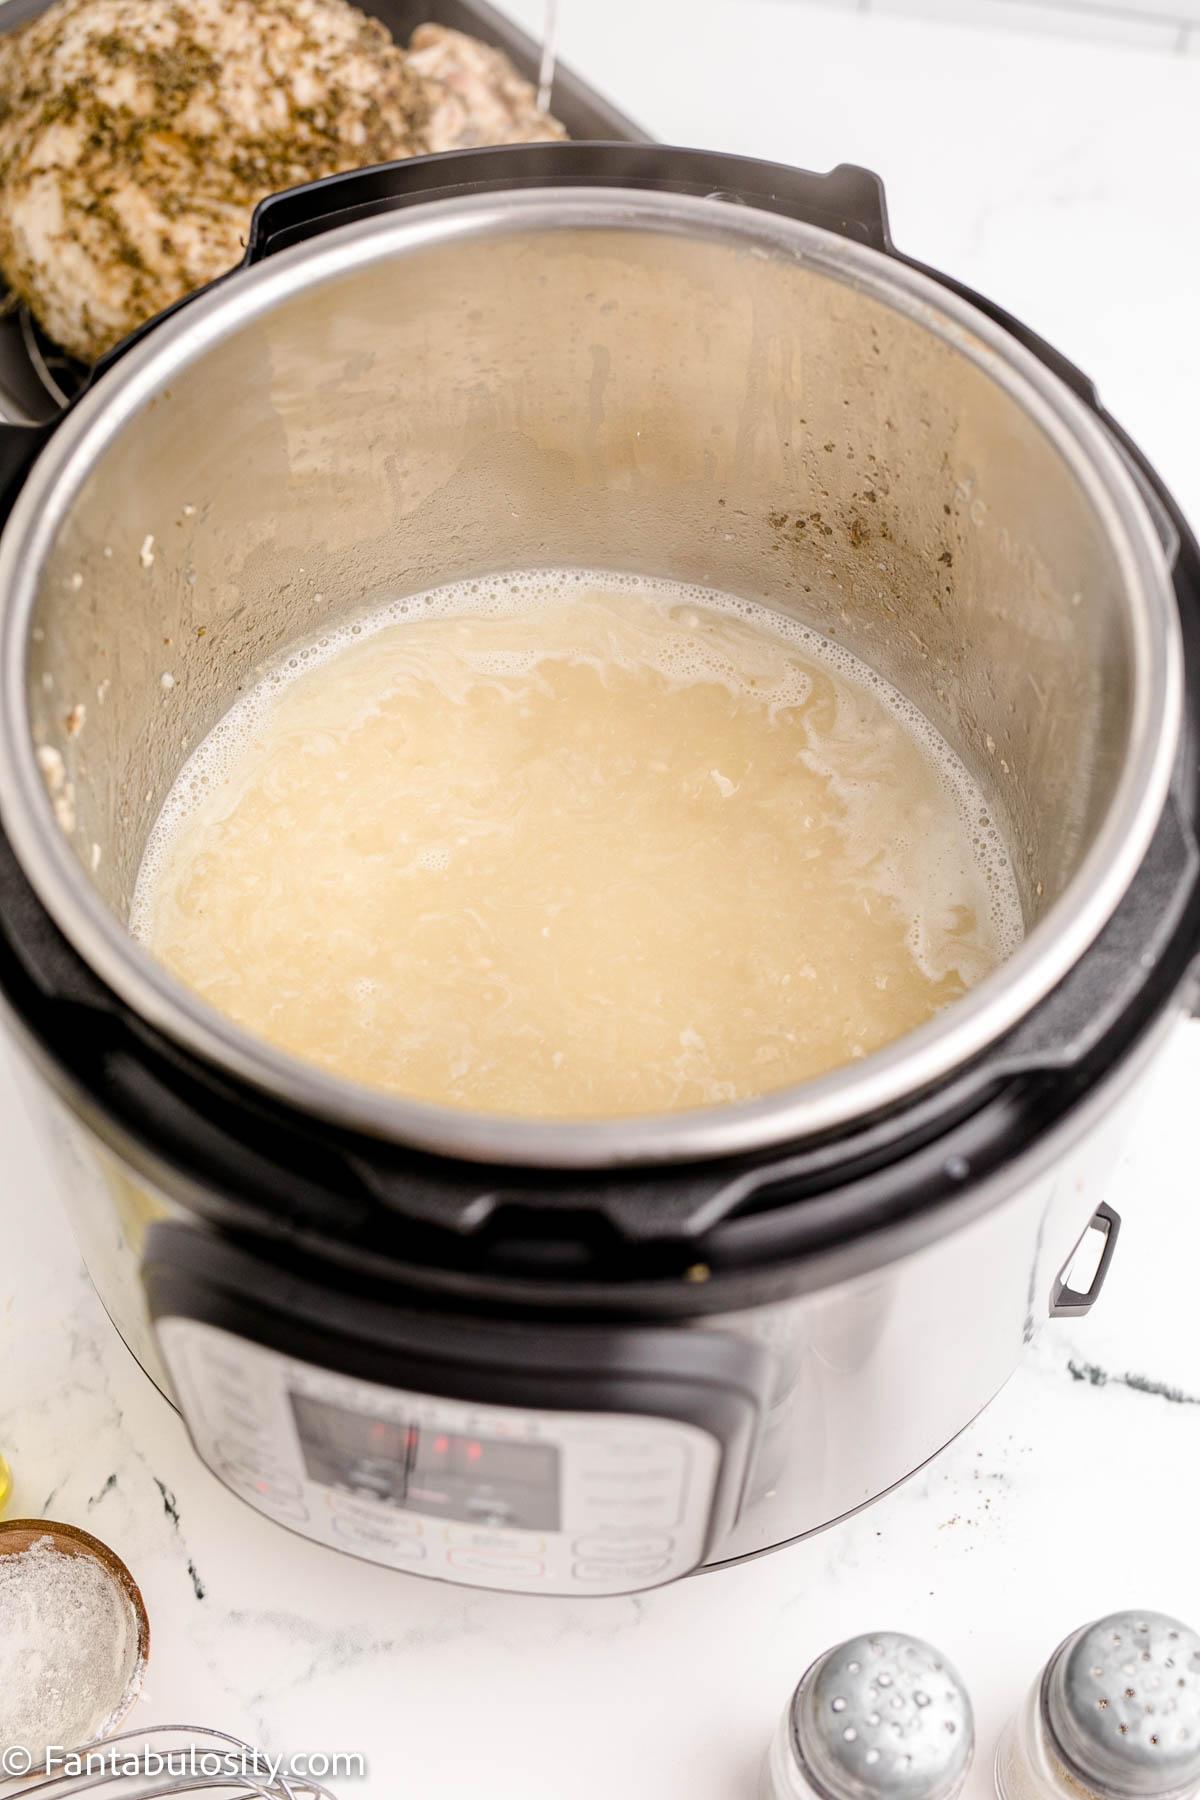 Stir until evenly combined